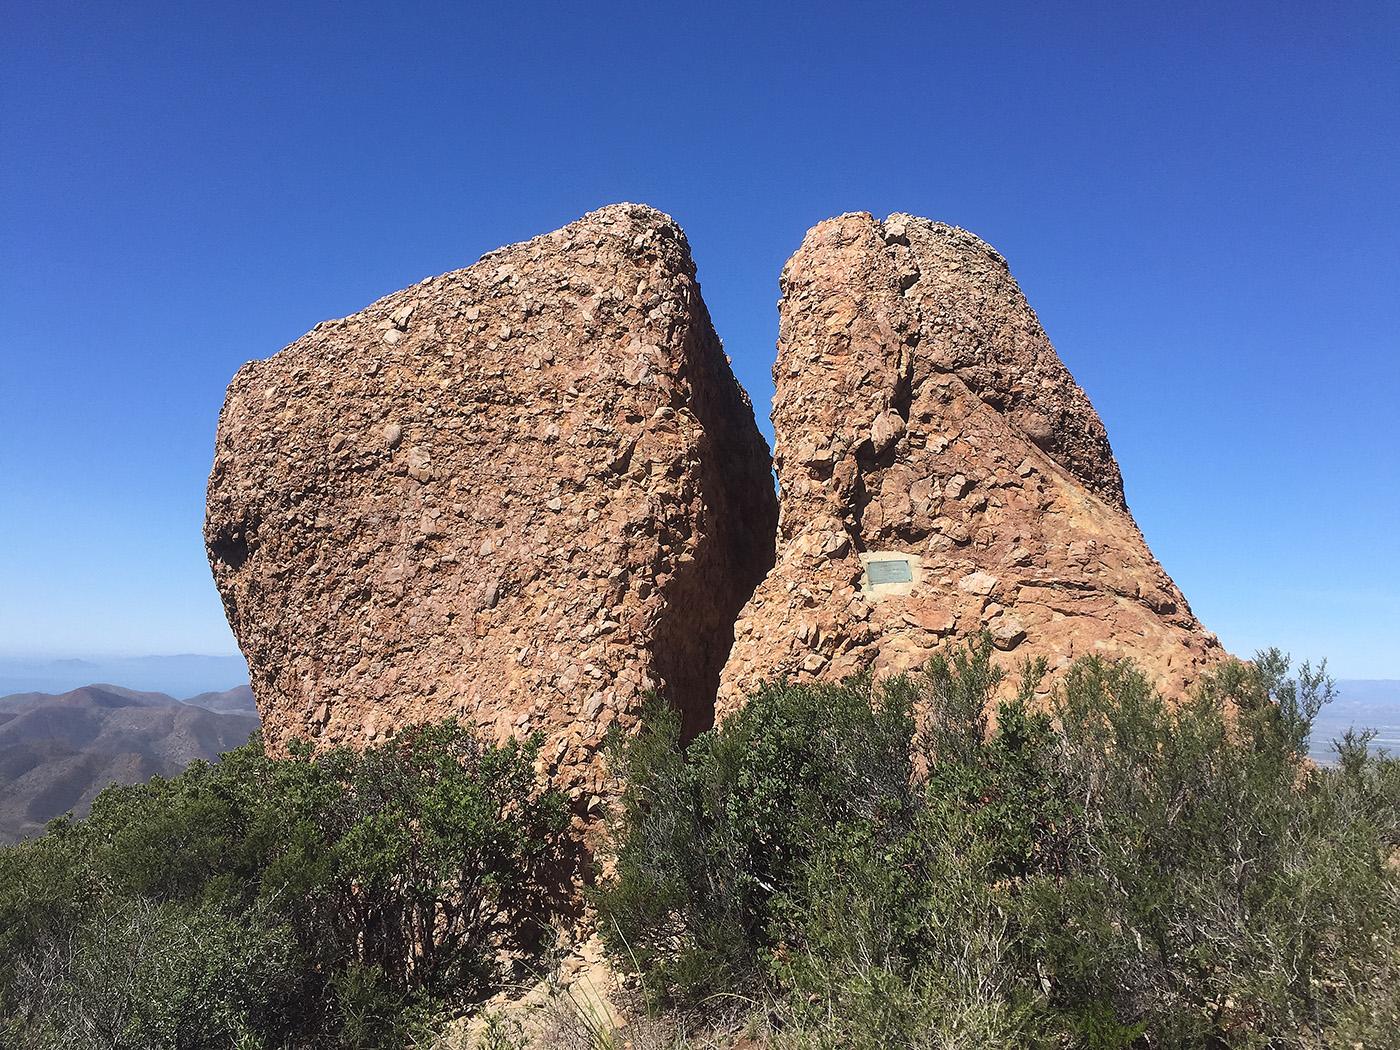 backbone-trail-trailnamebackstroke-3684.jpg